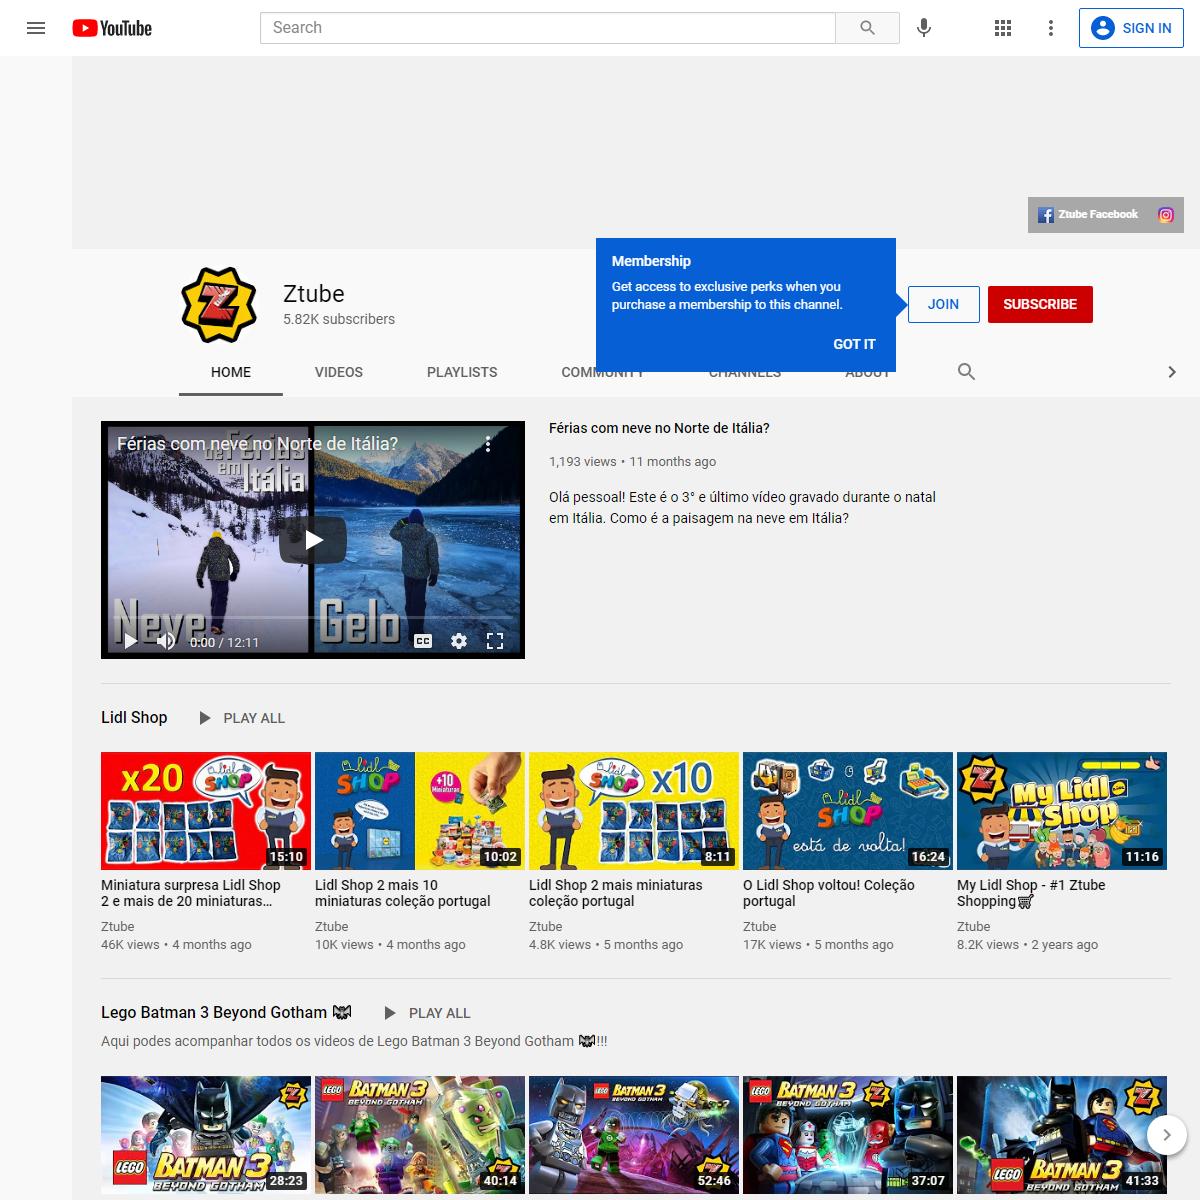 Ztube - YouTube